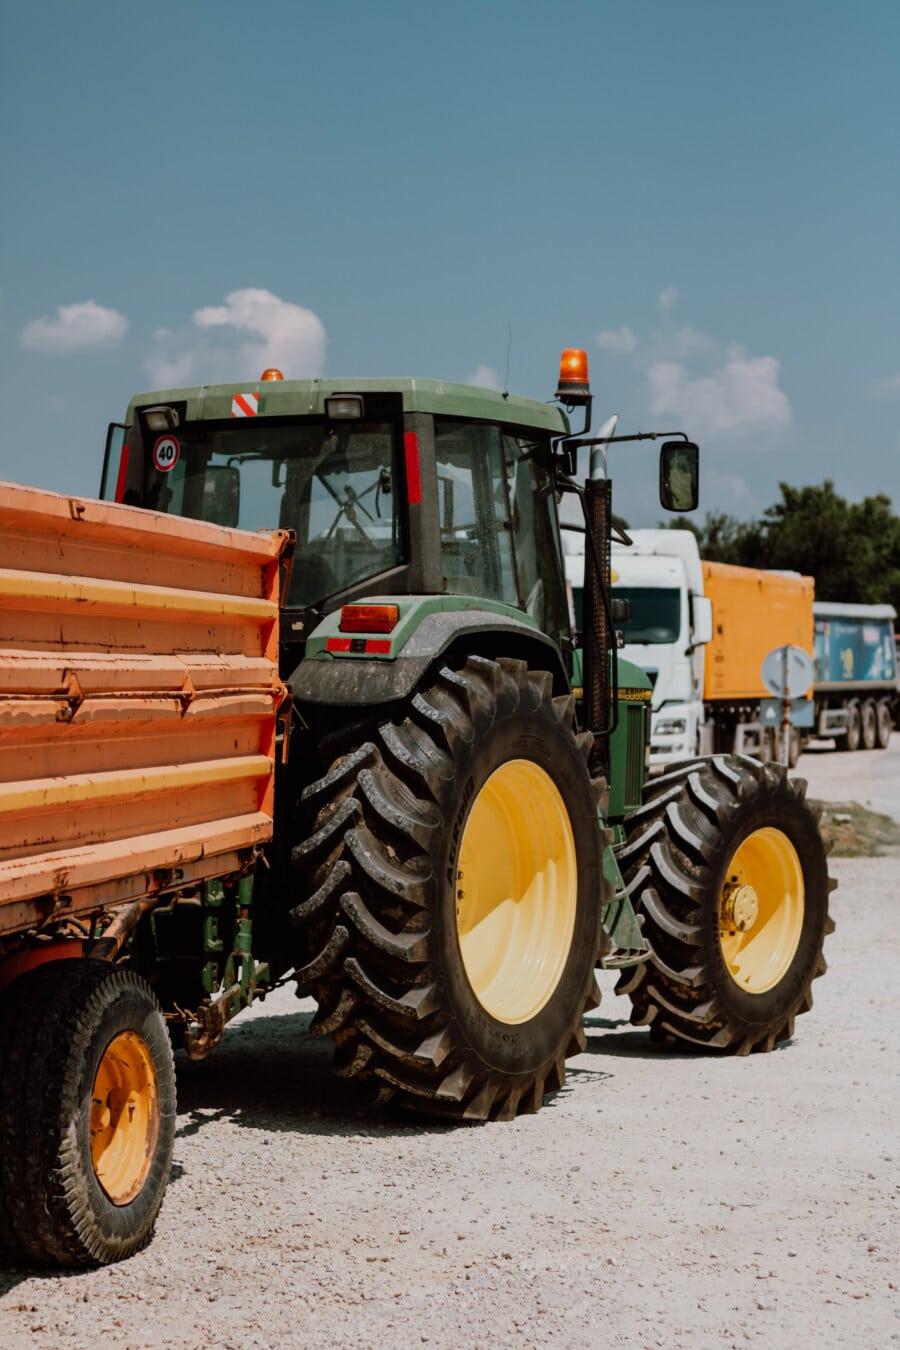 Traktor, Anhänger, Fracht, industrielle, Versand, Fahrzeuge, schwere, Fahrzeug, Maschine, Branche